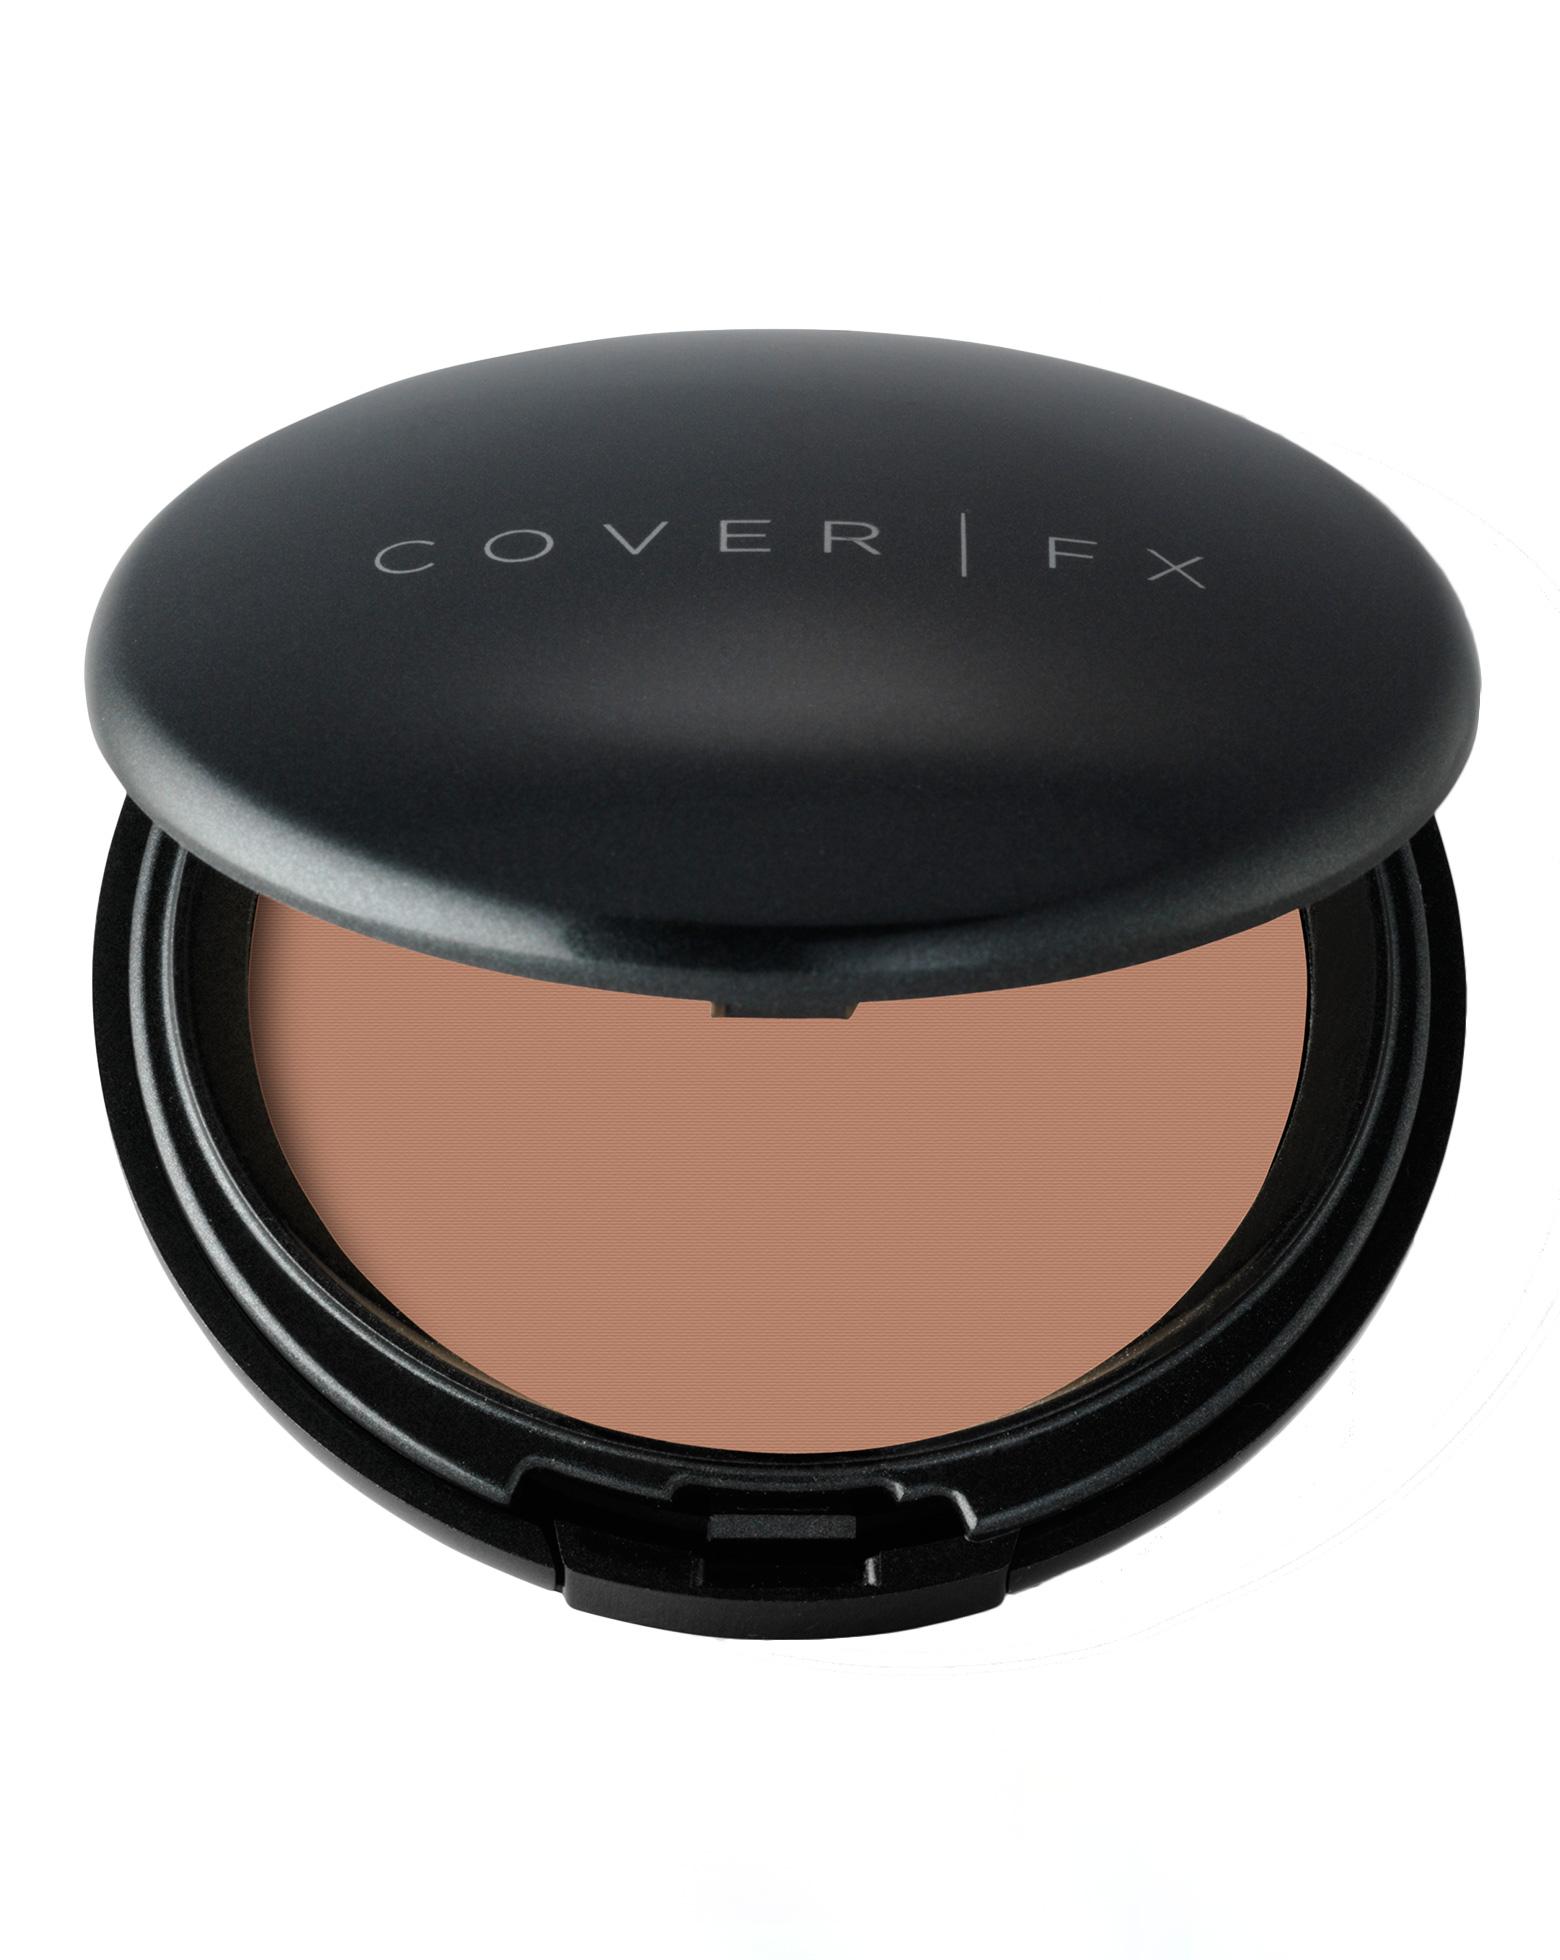 CoverFx Bronzer